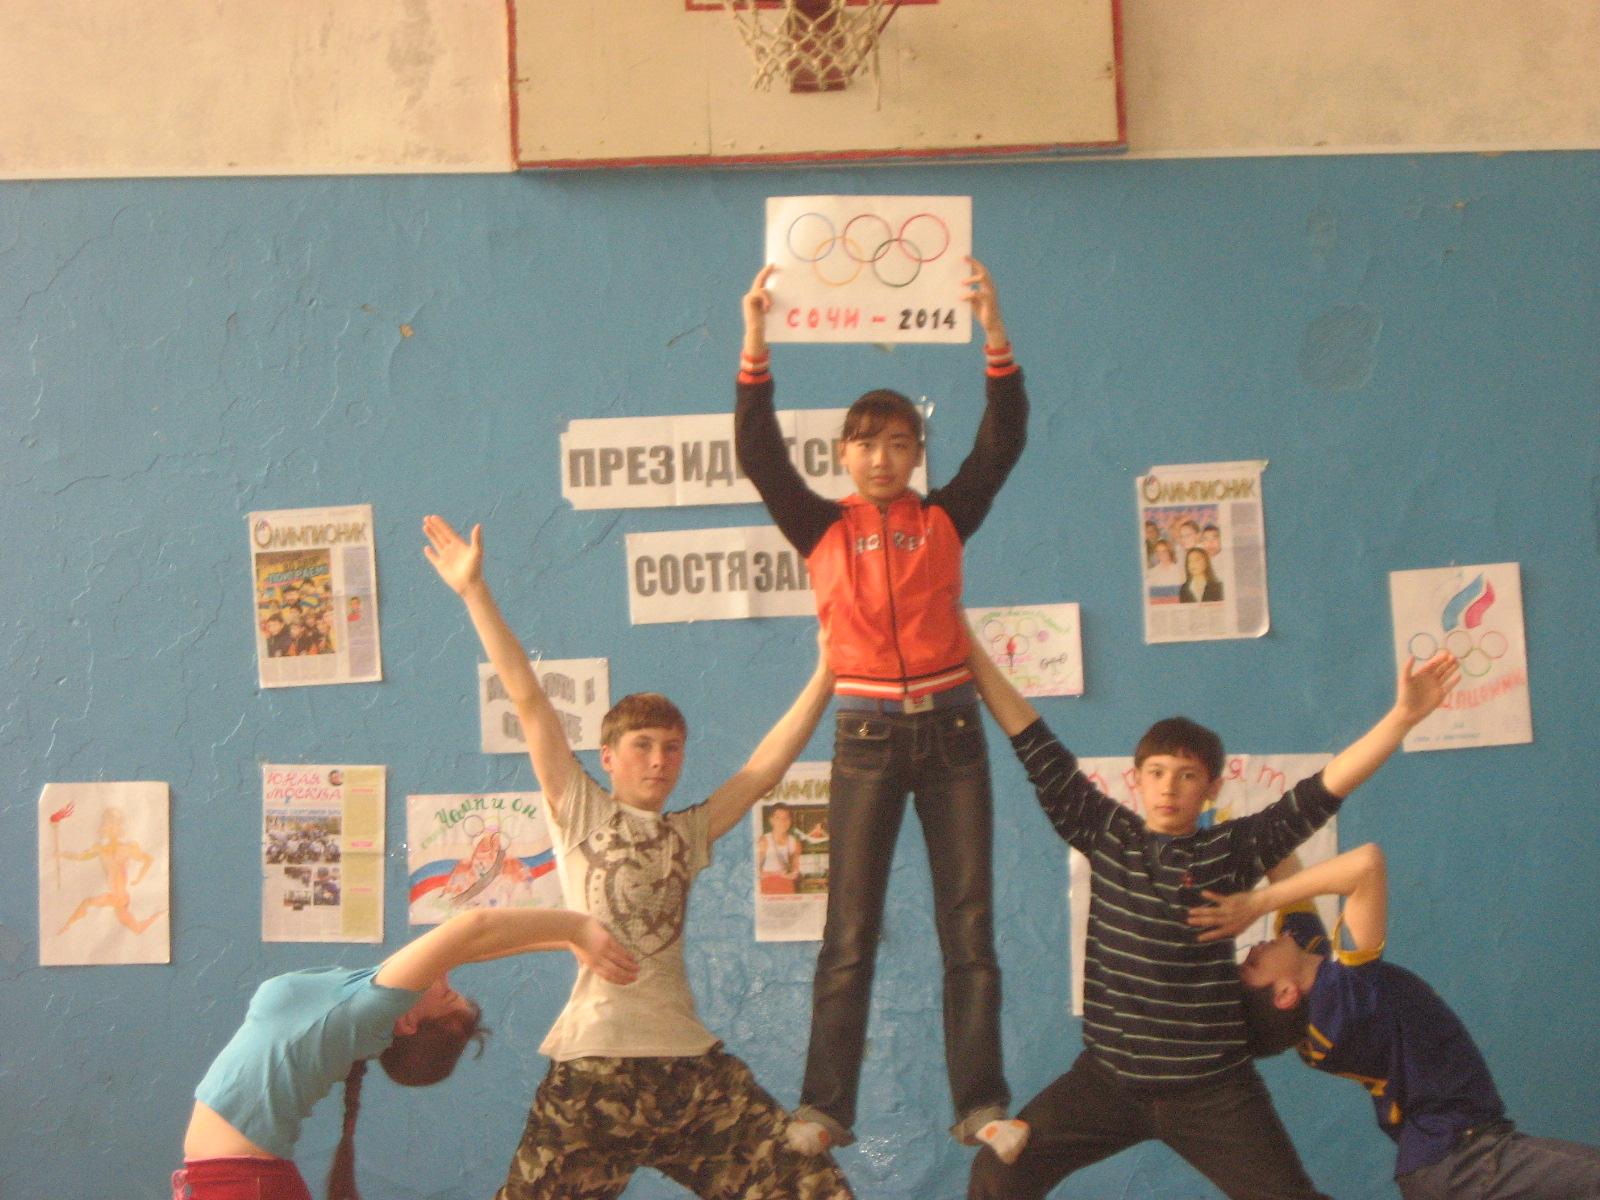 Спартакиада сценарий в школе